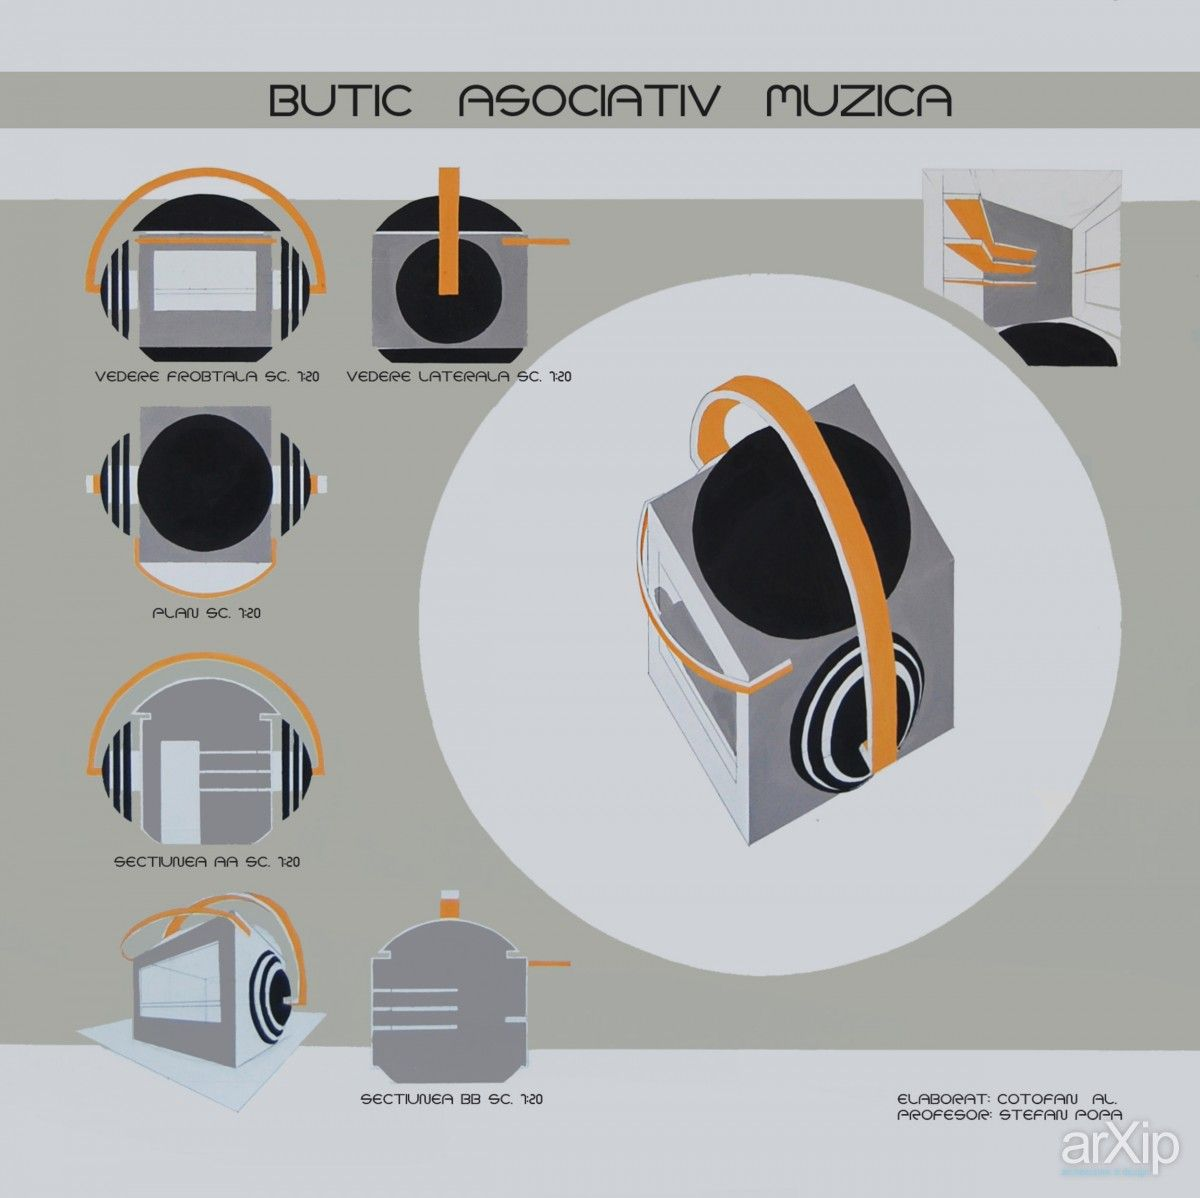 Music box (concept): архитектура, 1 эт   3м, хай-тек, 0 - 100 м2, бутик, каркас - металл, здание, строение, фасад - алюминиевые панели #architecture #1fl_3m #hitech #0_100m2 #boutique #frame_metal #highrisebuilding #structure #facade_thealuminumpanels